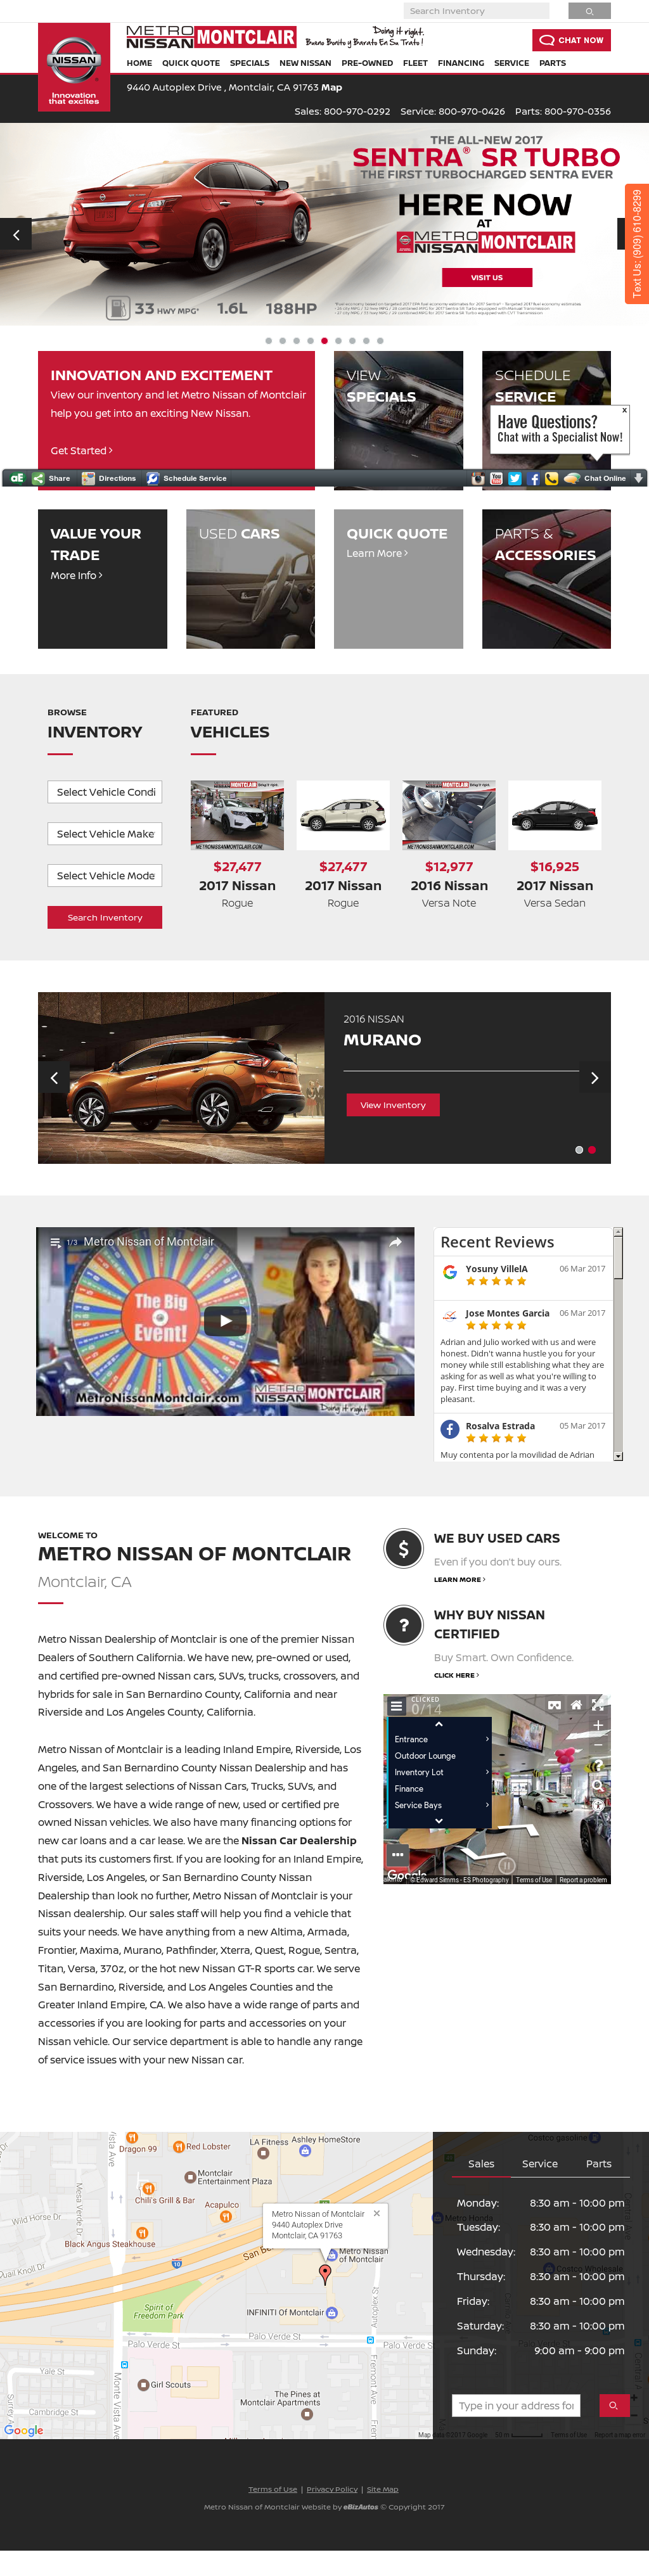 Metro Nissan Of Montclair Website History